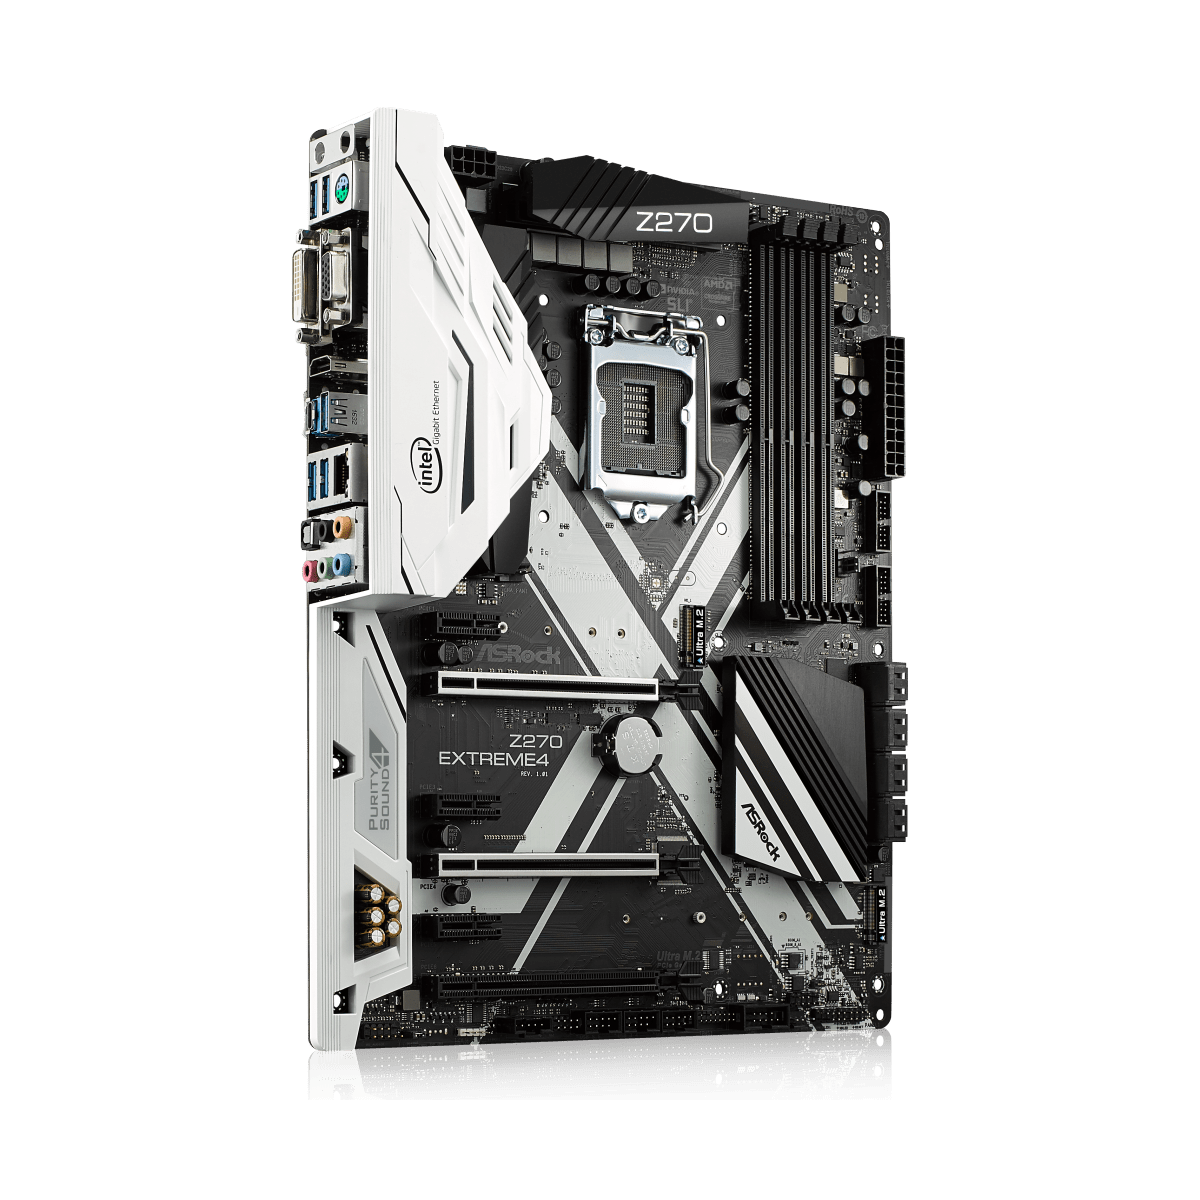 Placa Mãe ASROCK Z270 Extreme4, Chipset Z270, Intel LGA 1151, ATX, DDR4